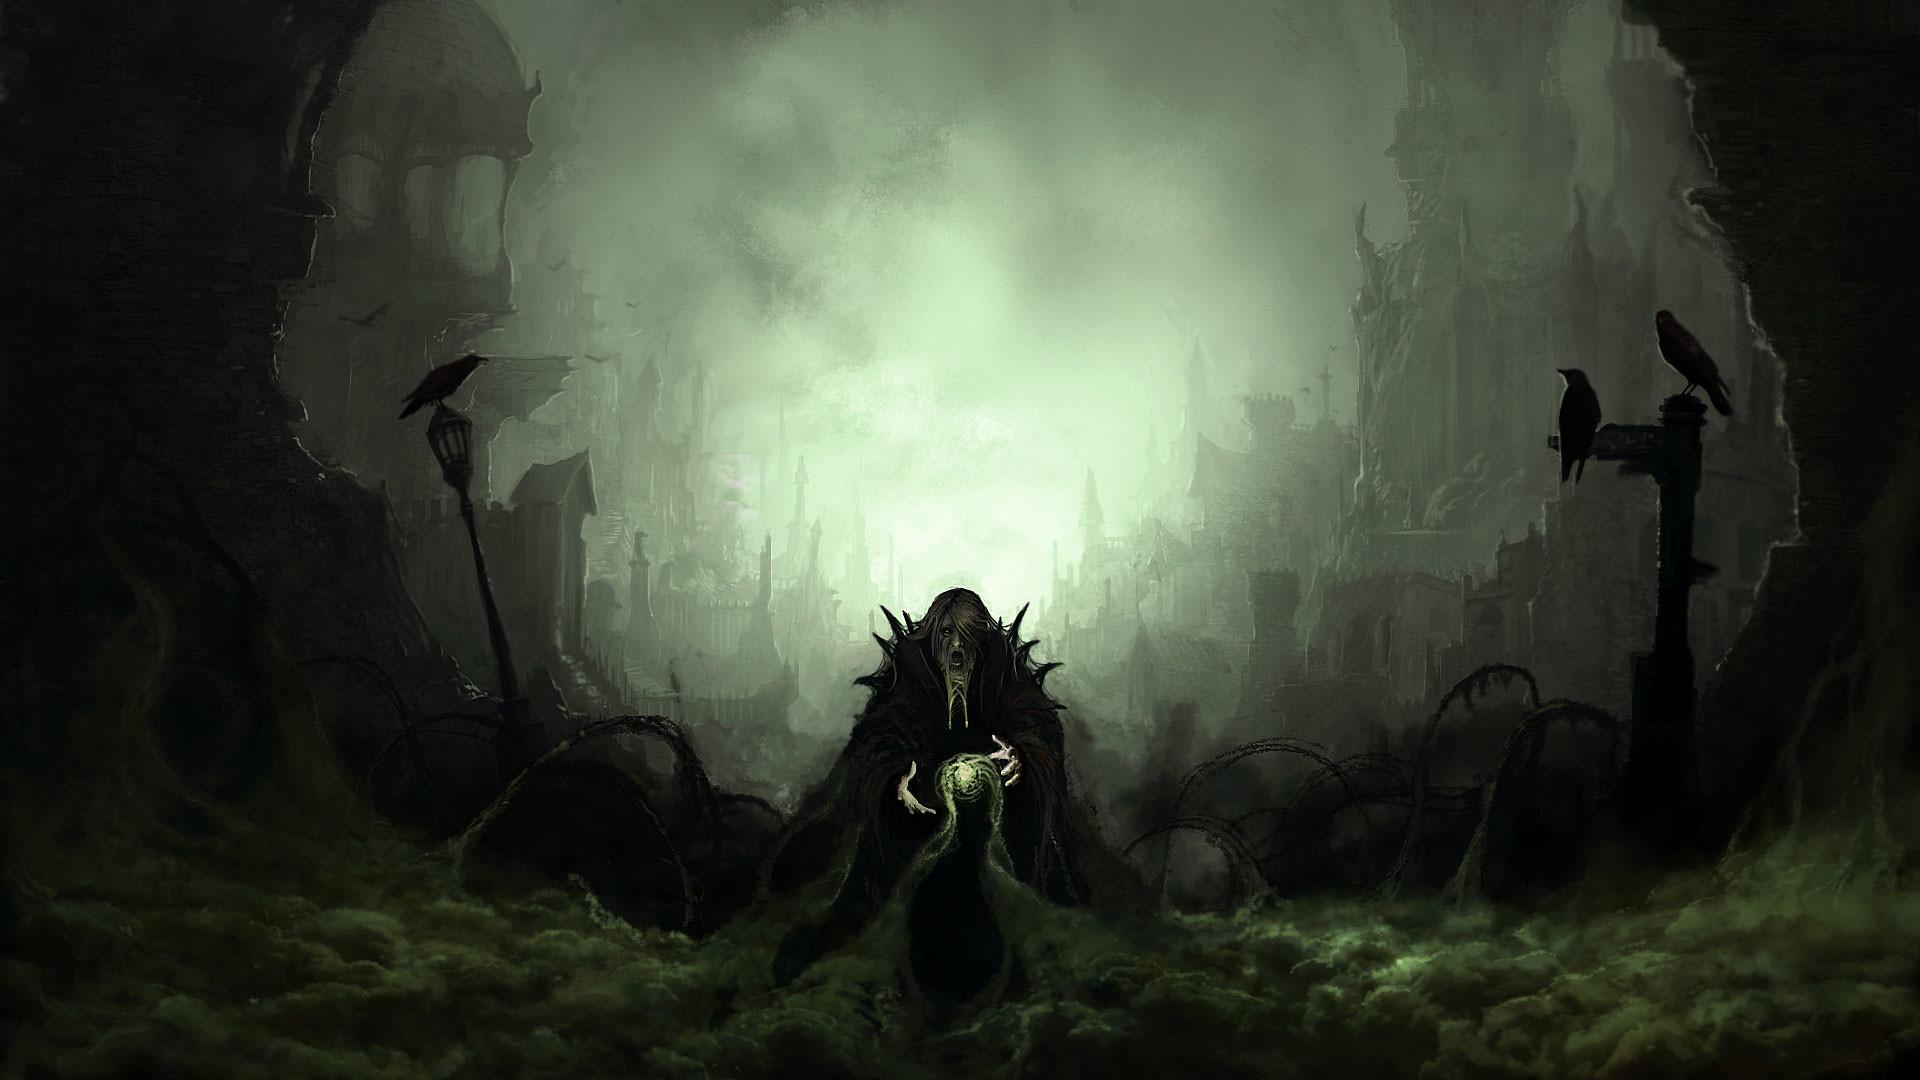 hd pics photos attractive fantasy castles horror art hd quality desktop  background wallpaper